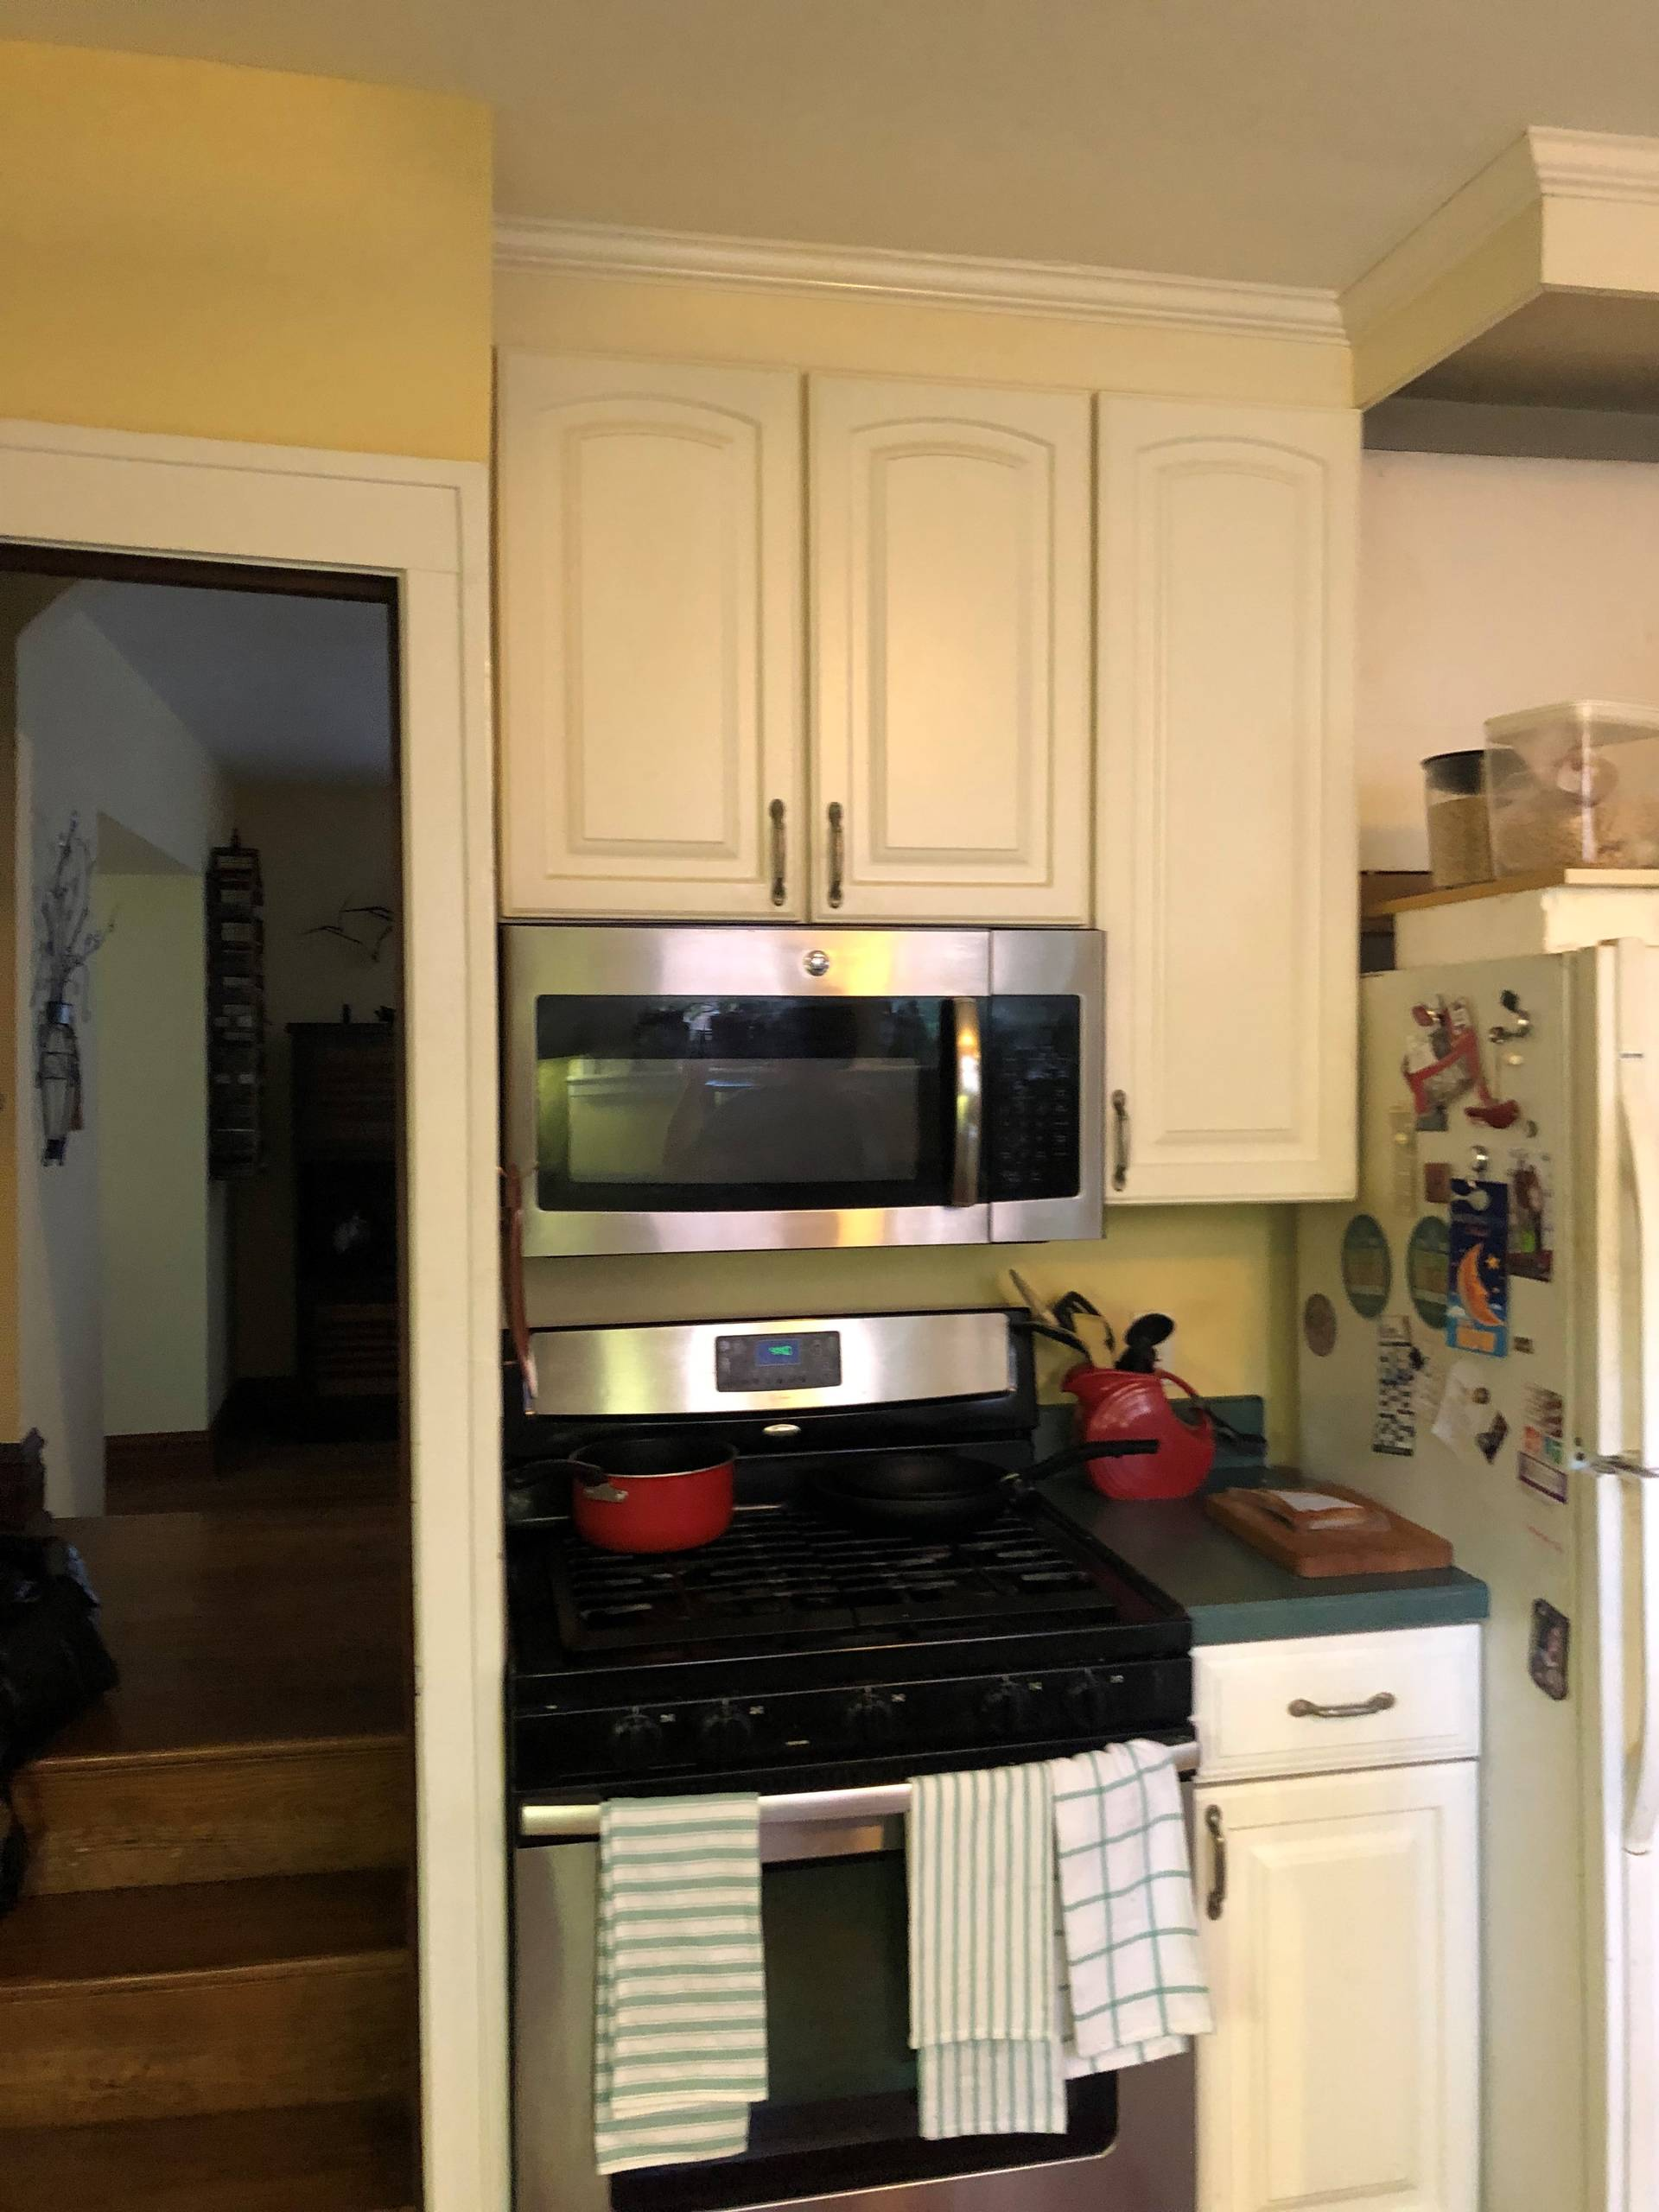 zeman kitchen before